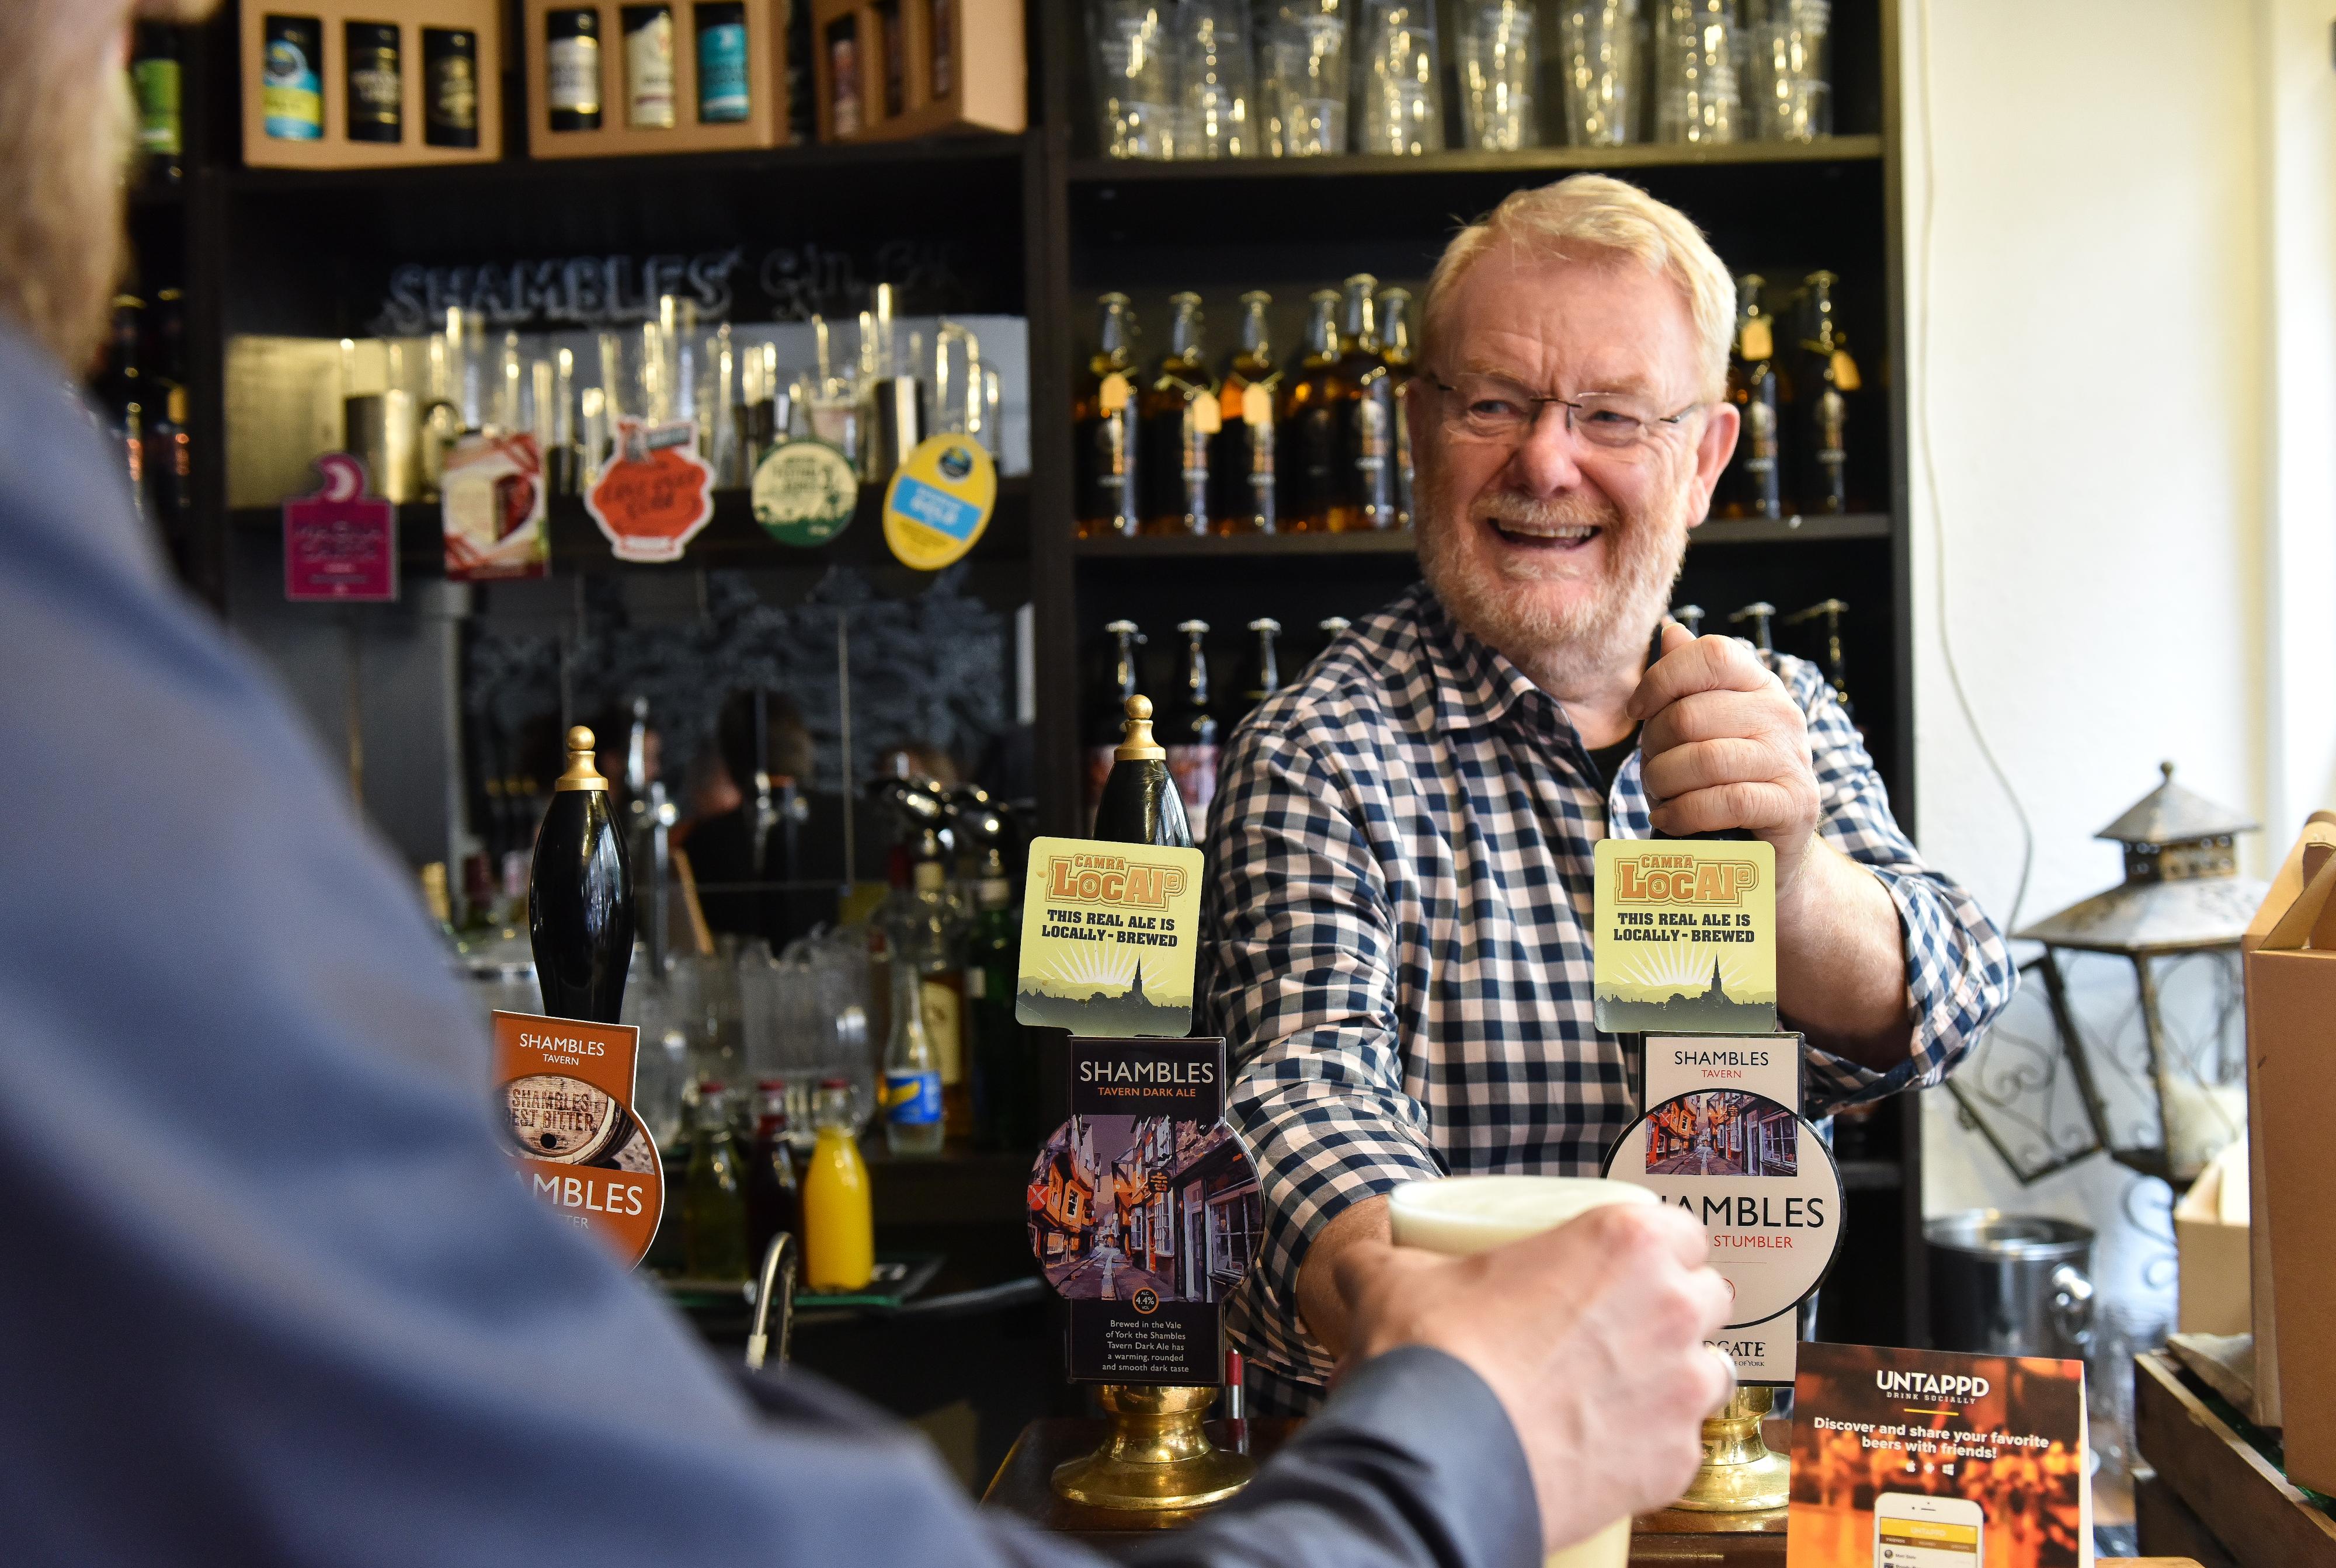 Pub owner Shambles Tavern